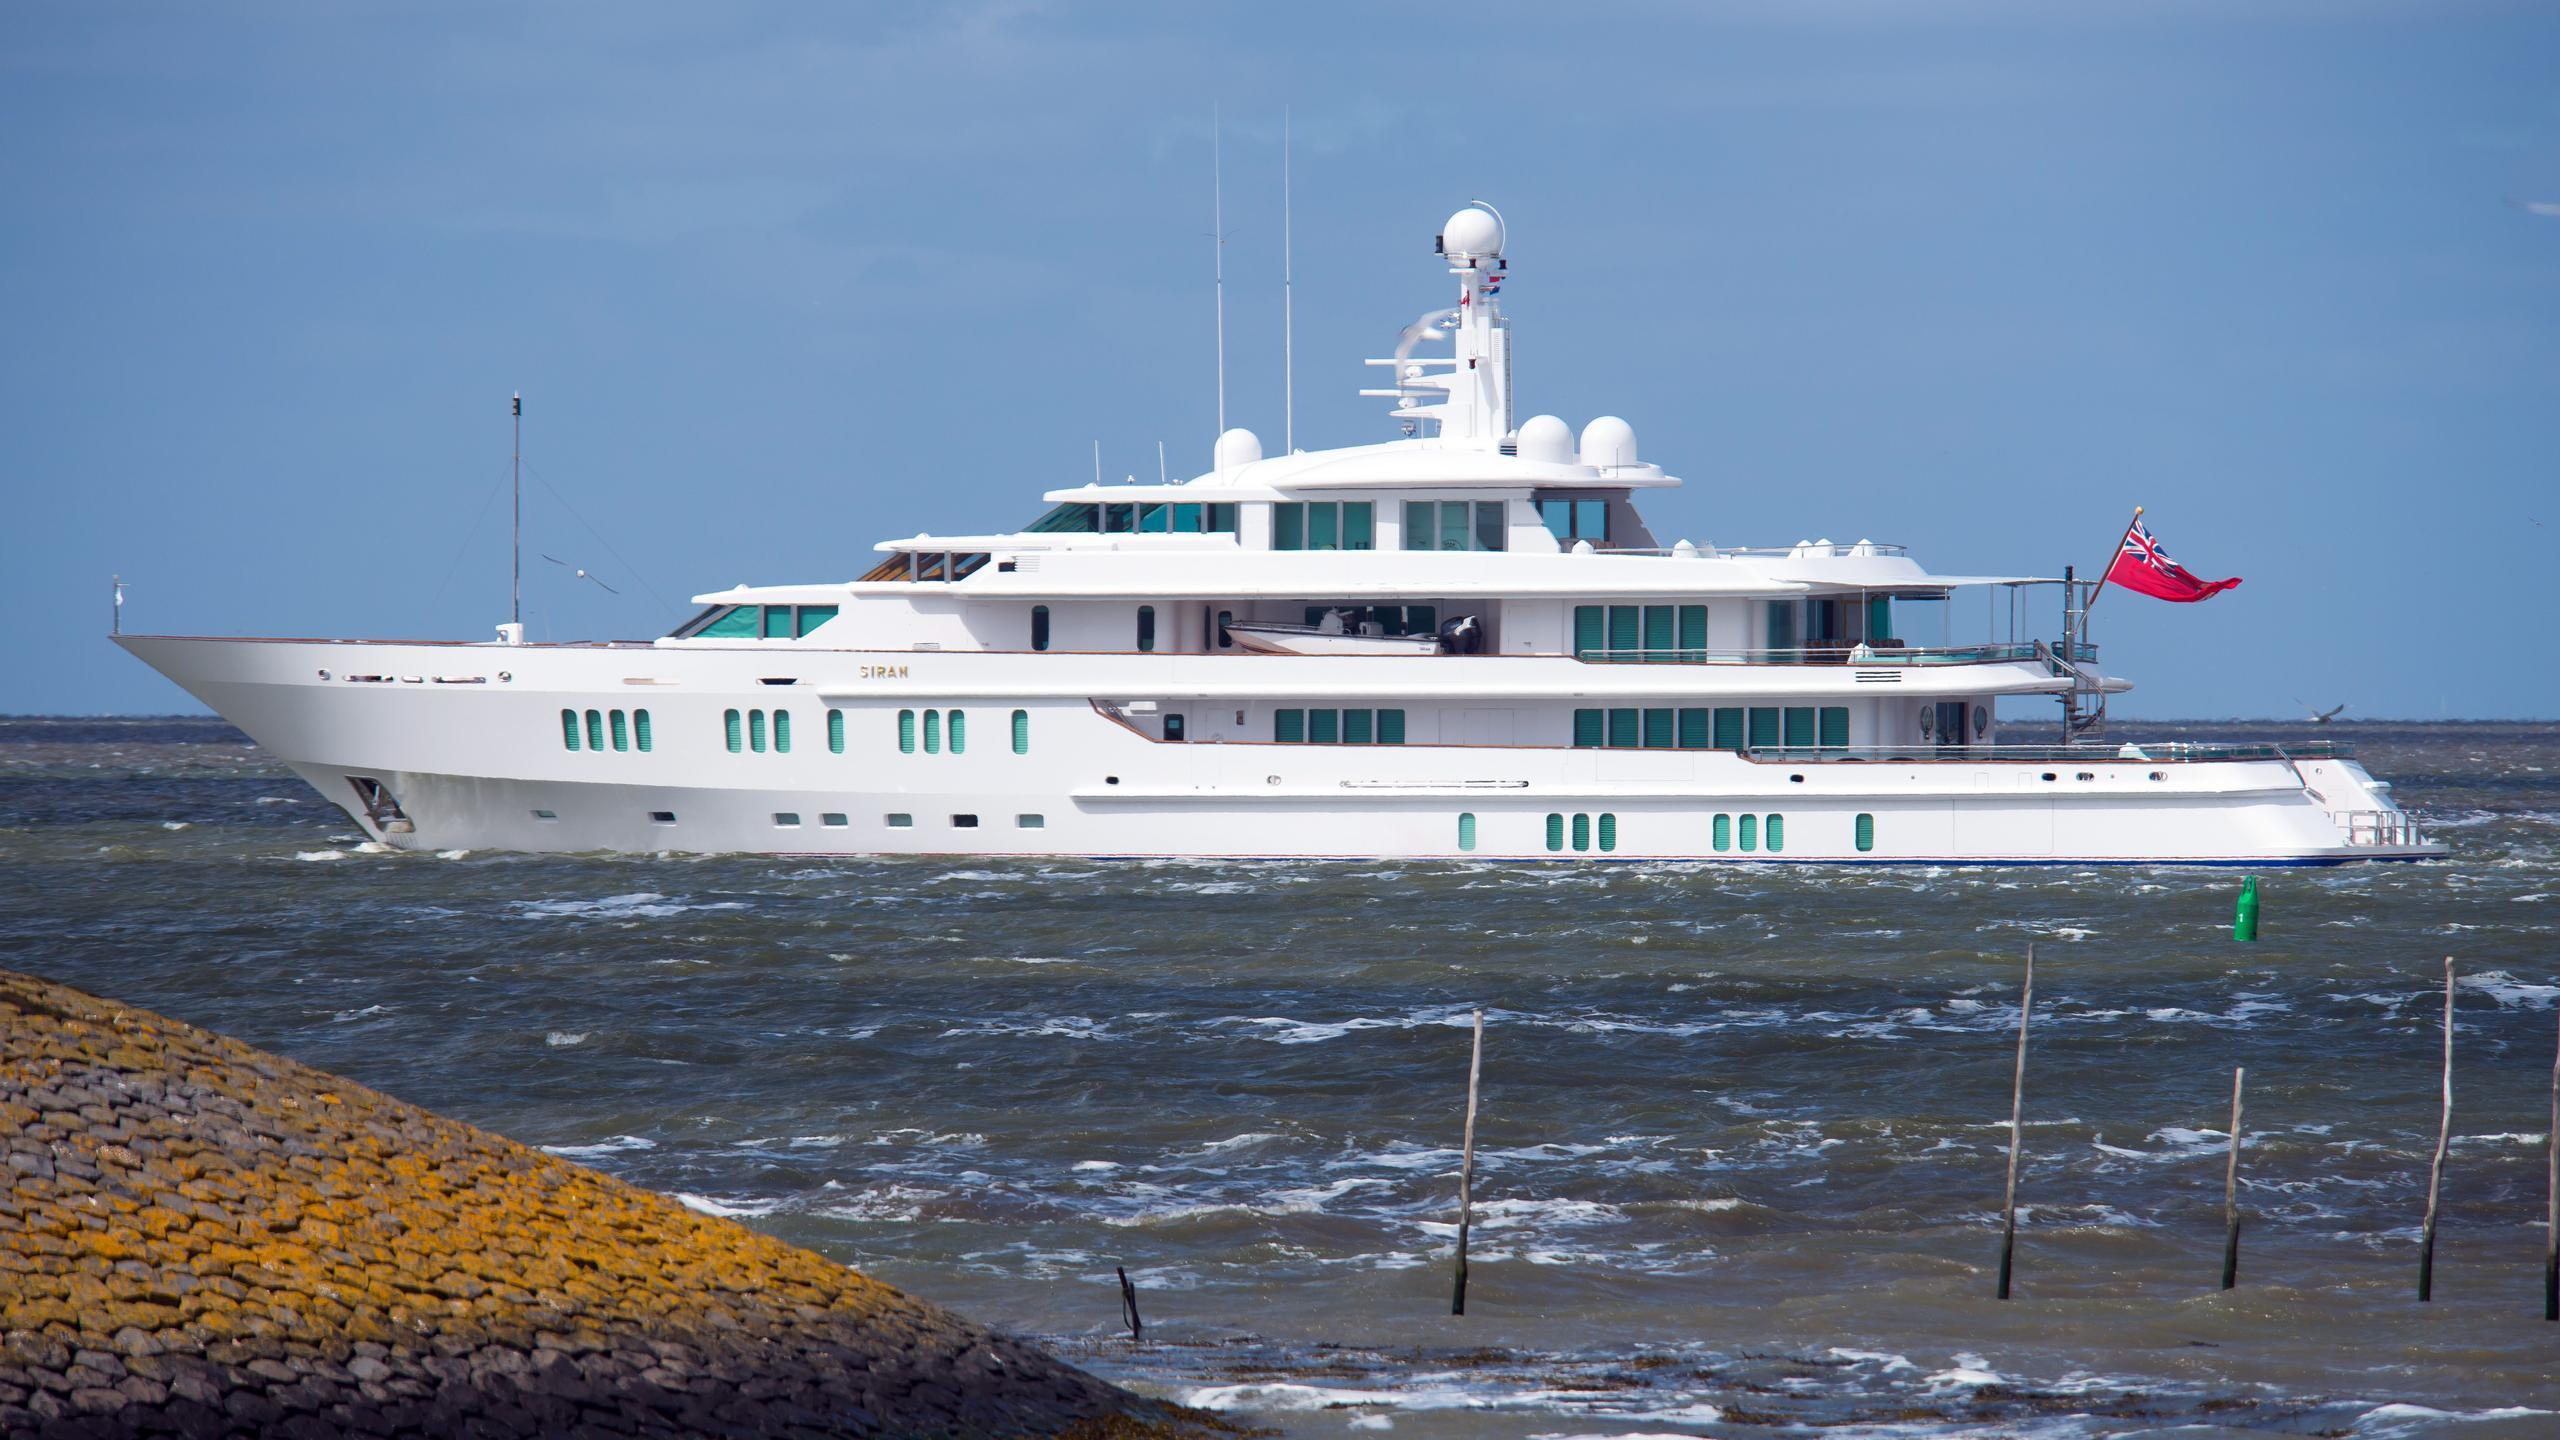 siran-2015-yacht-exterior